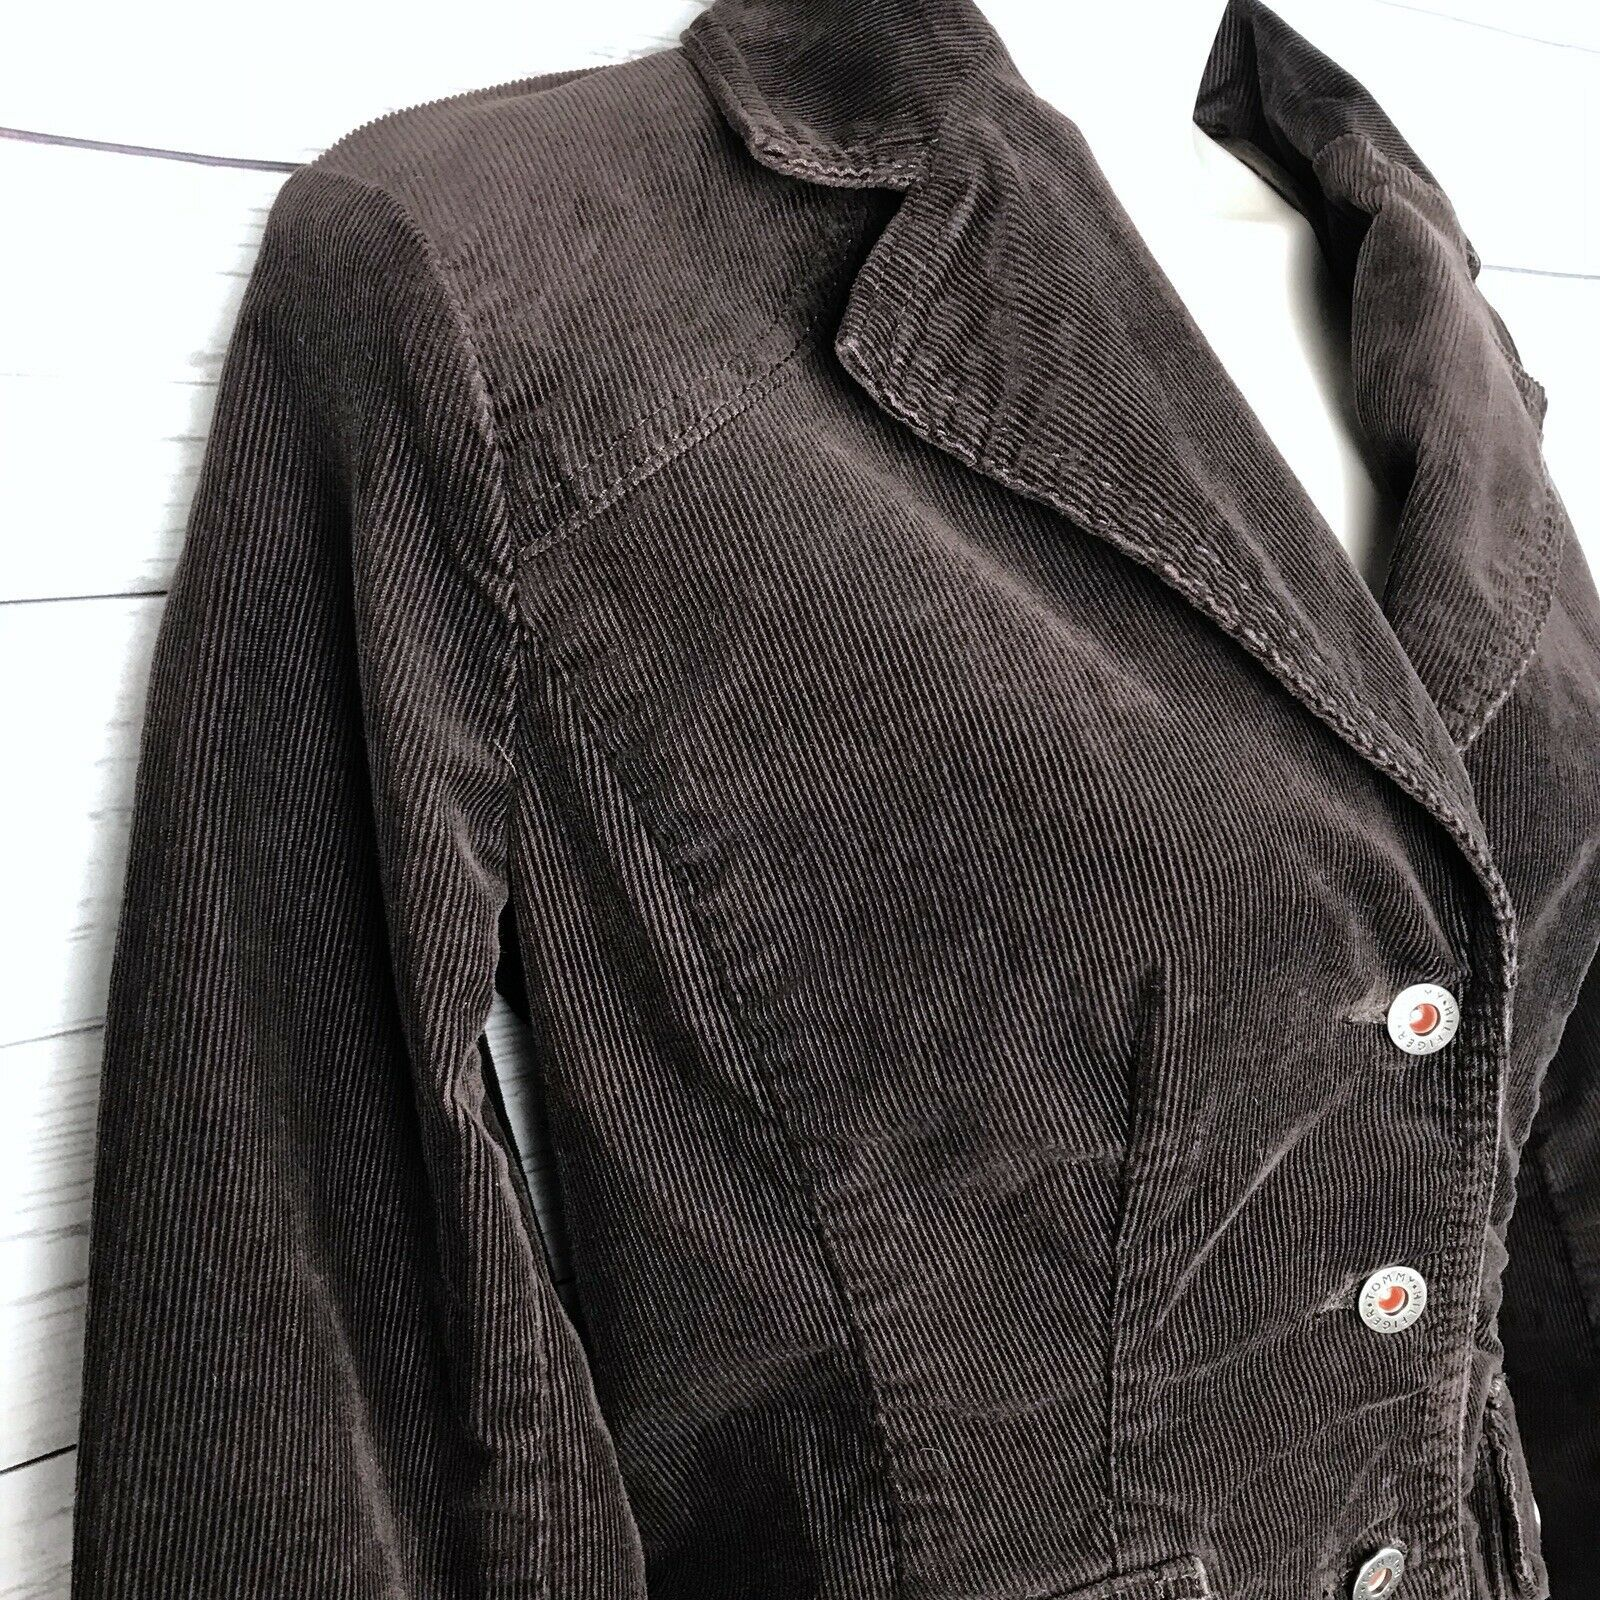 Tommy Hilfiger Corduroy Blazer Jacket Women's S Brown Stretch Button Long Sleeve image 6